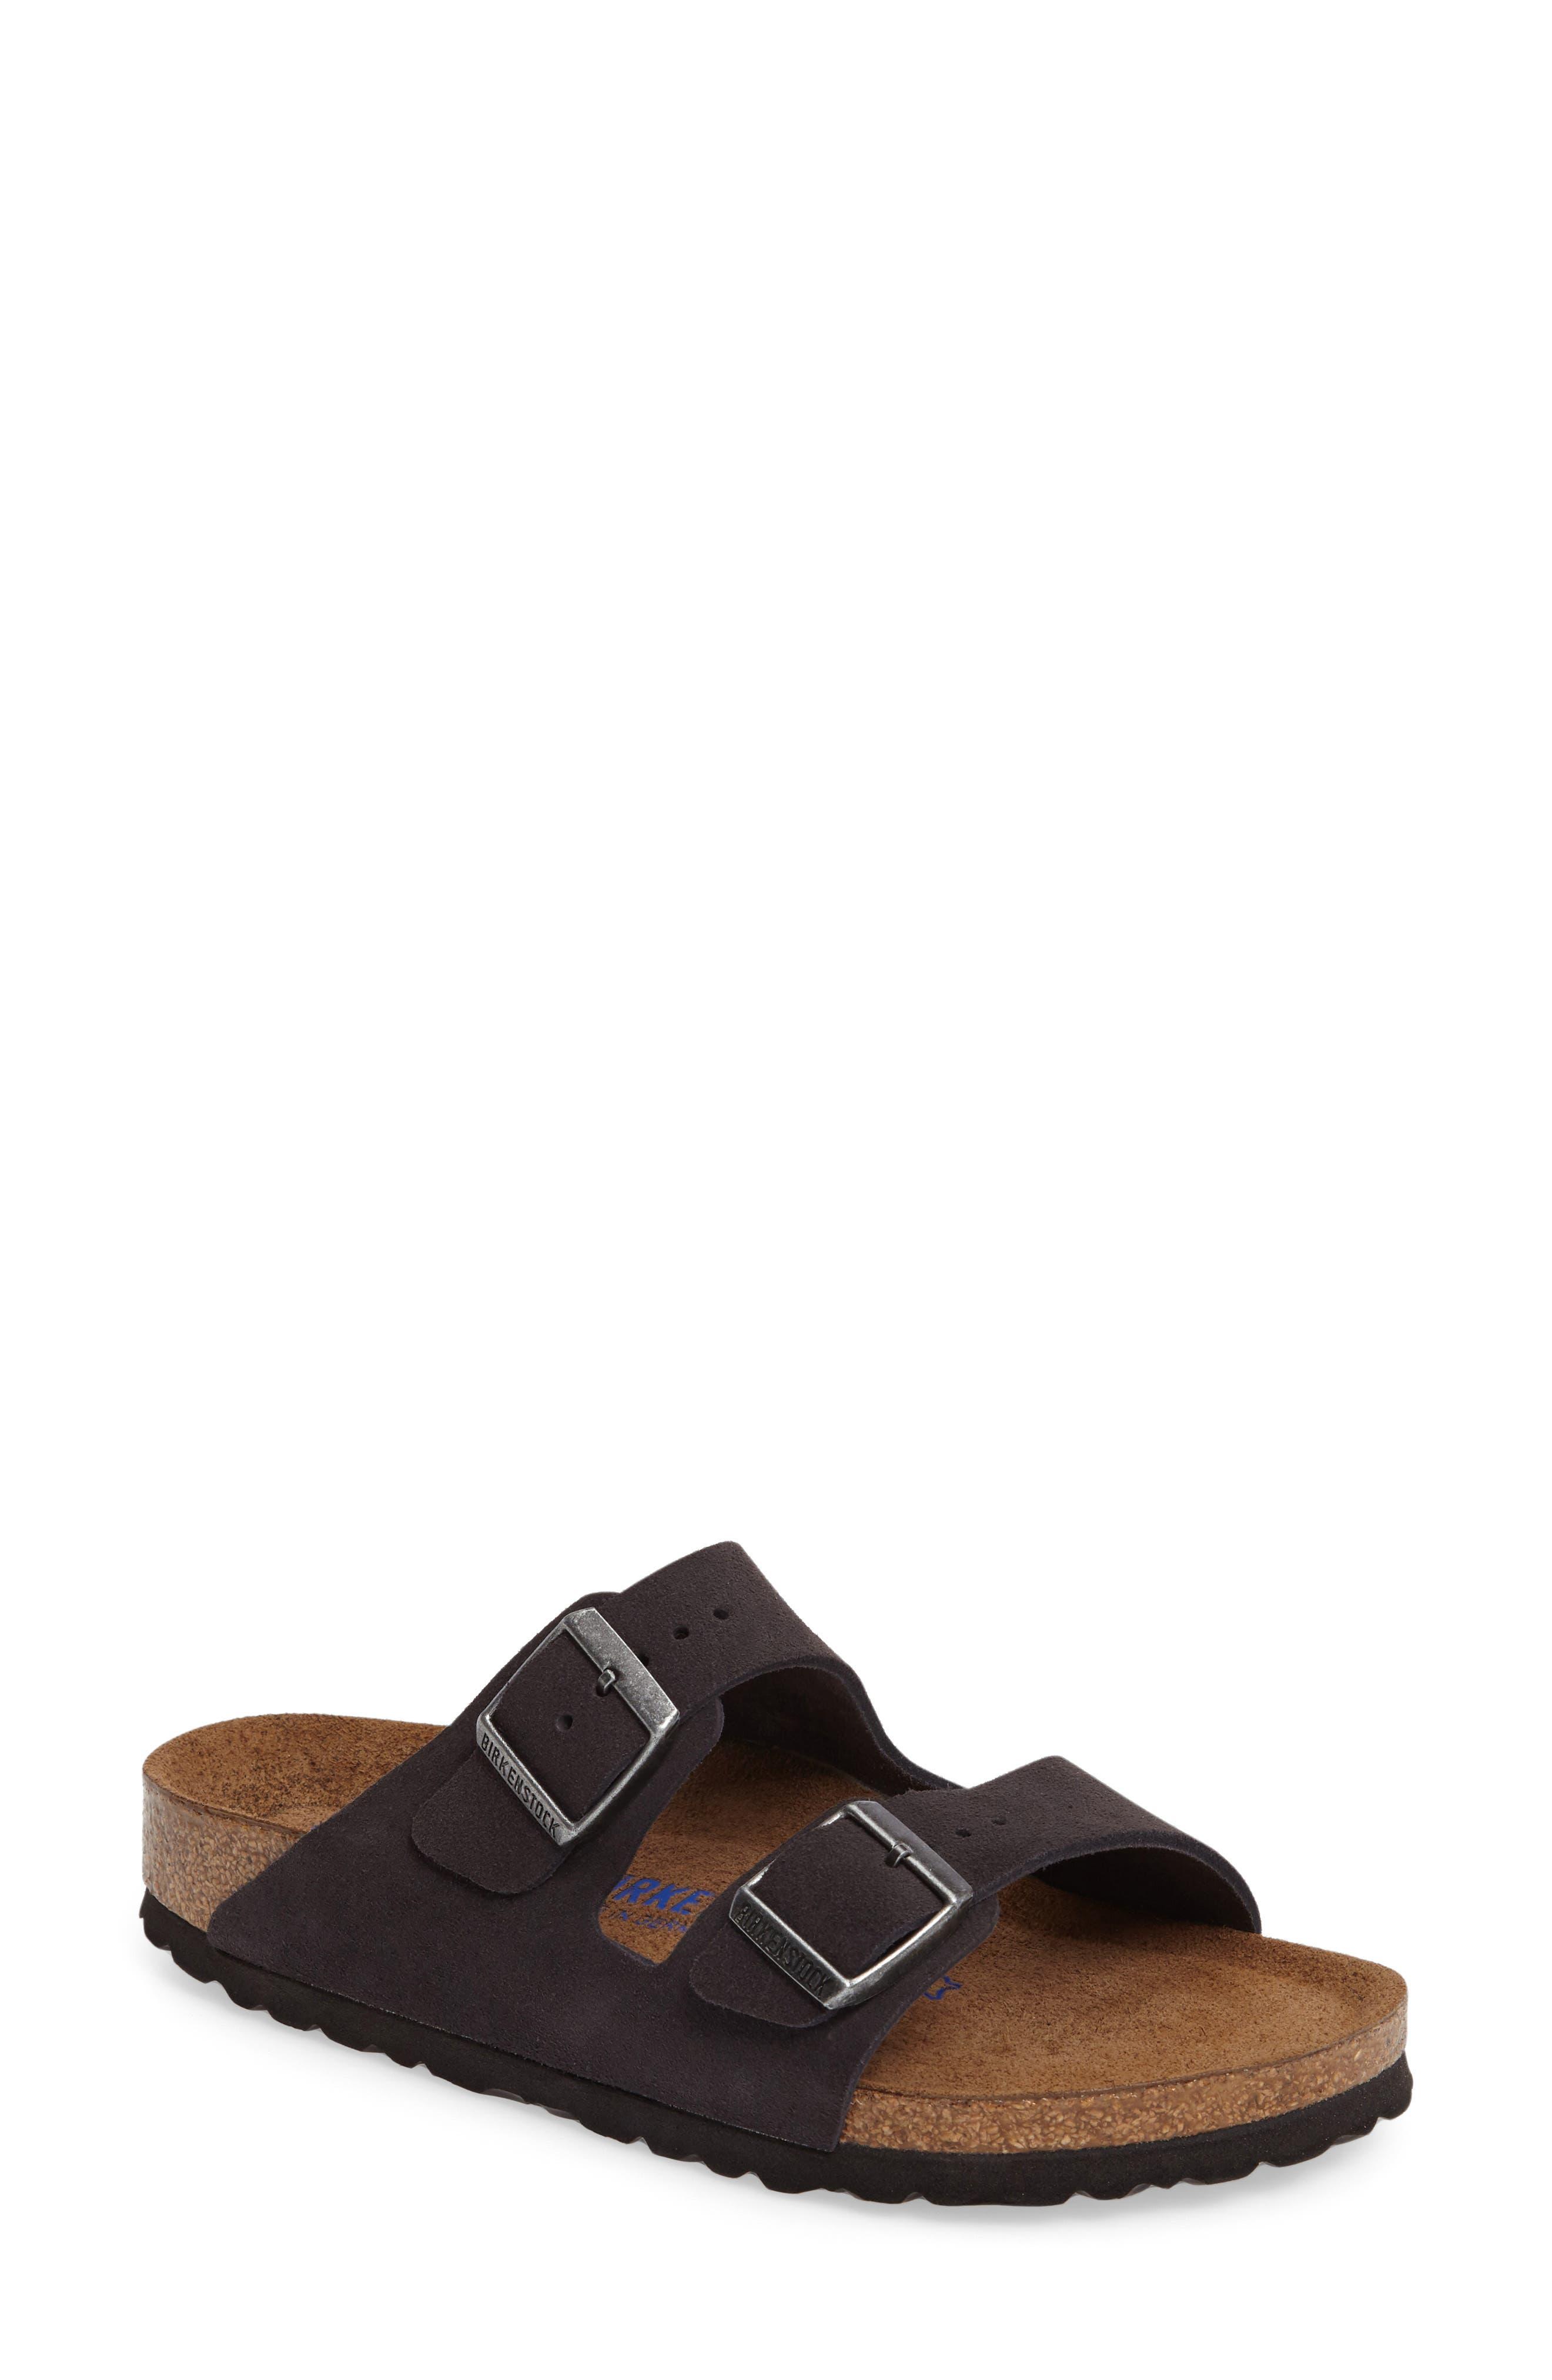 Main Image - Birkenstock 'Arizona' Soft Footbed Sandal (Women)